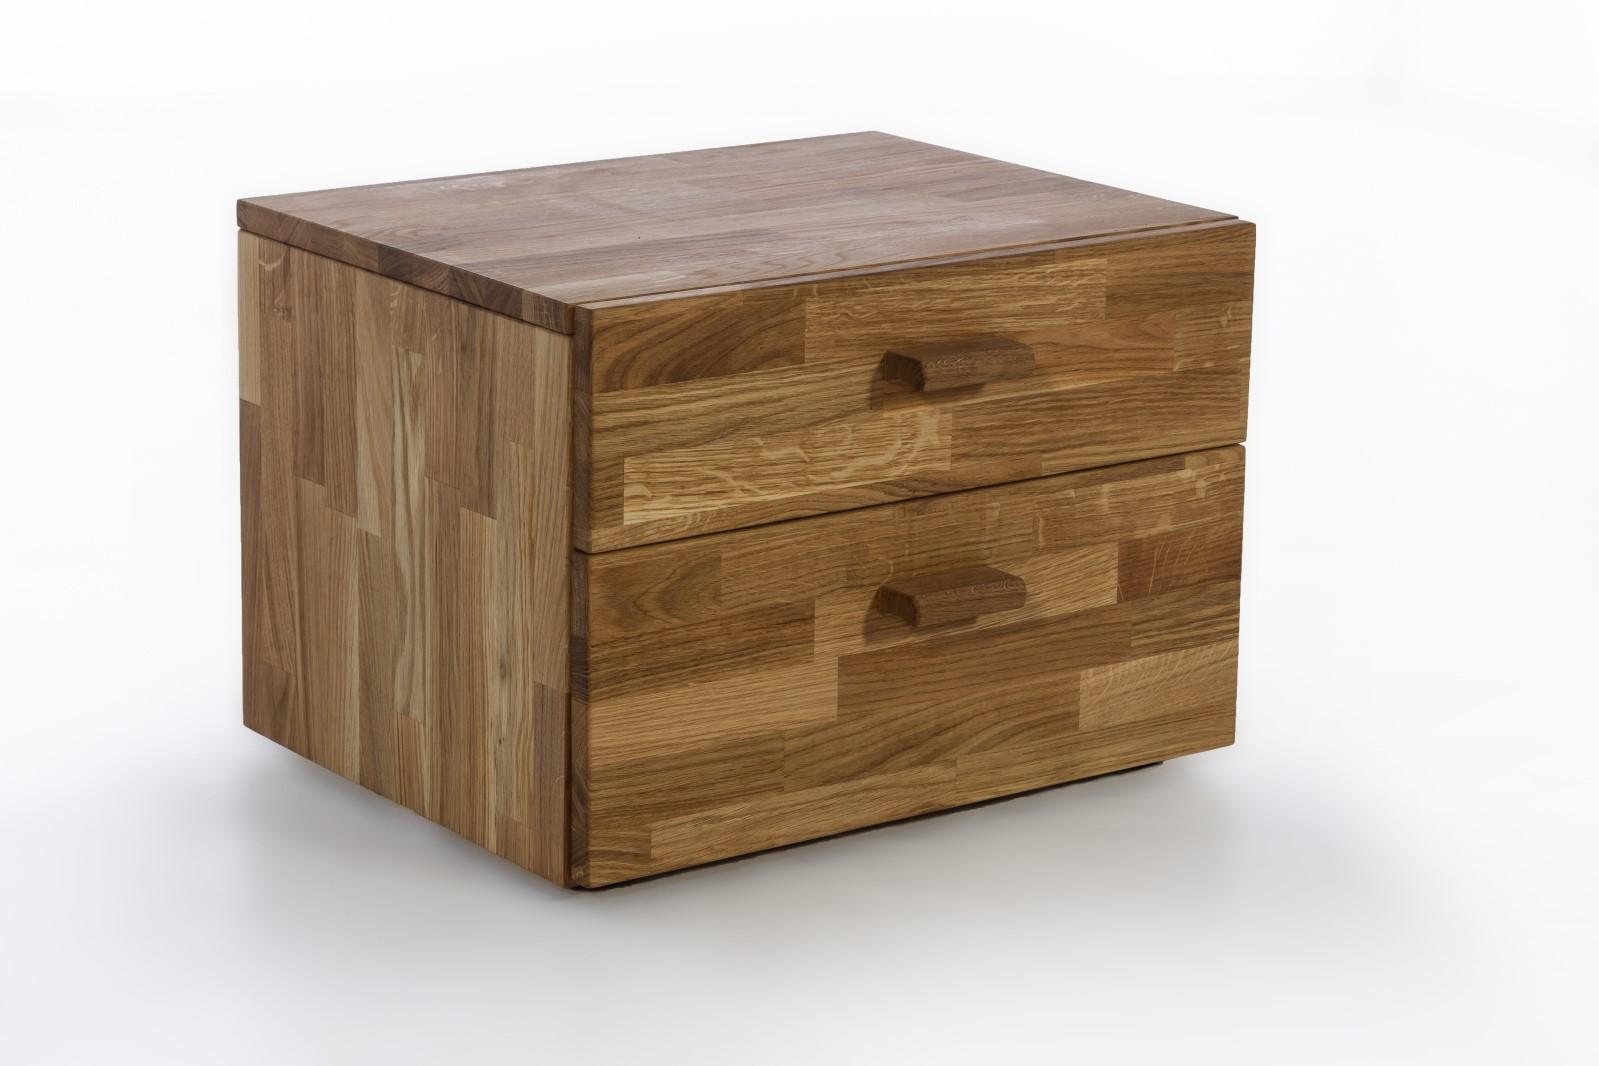 polsterbett bett doppelbett tagesbett arizona 140x200. Black Bedroom Furniture Sets. Home Design Ideas